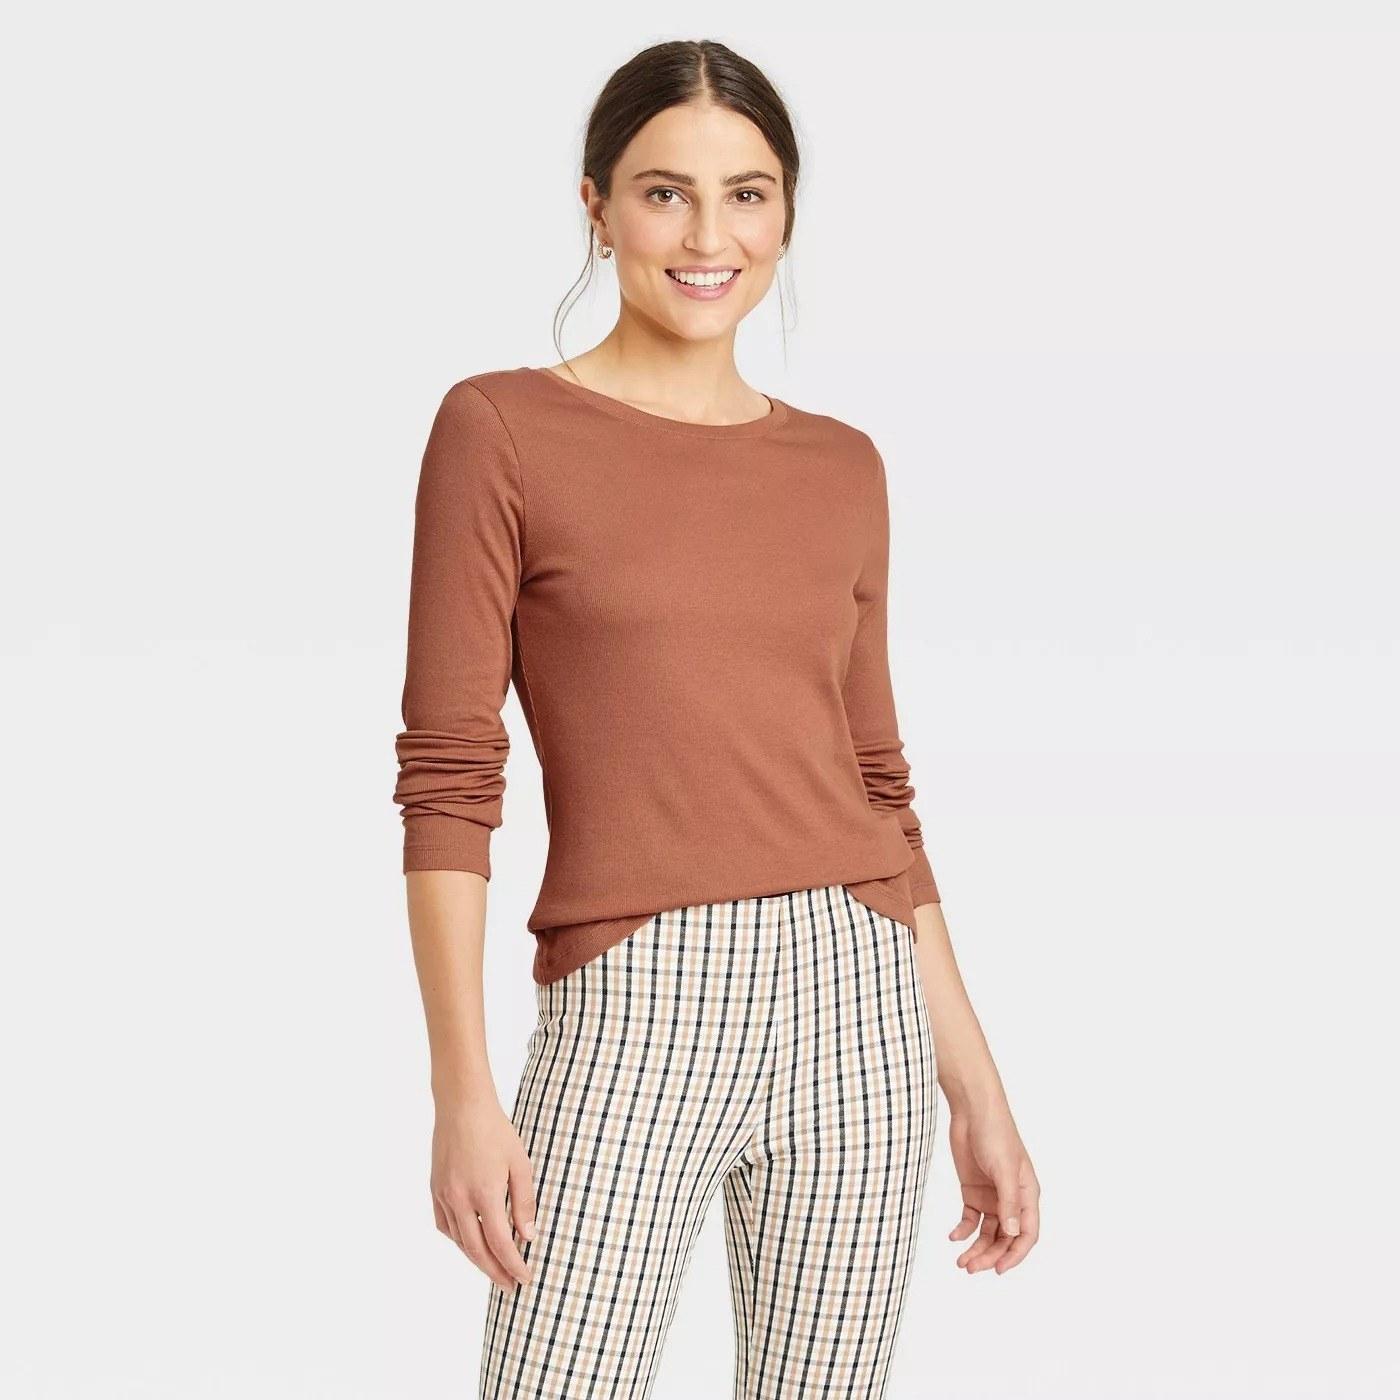 Model wearing brown long sleeve rib knit t-shirt